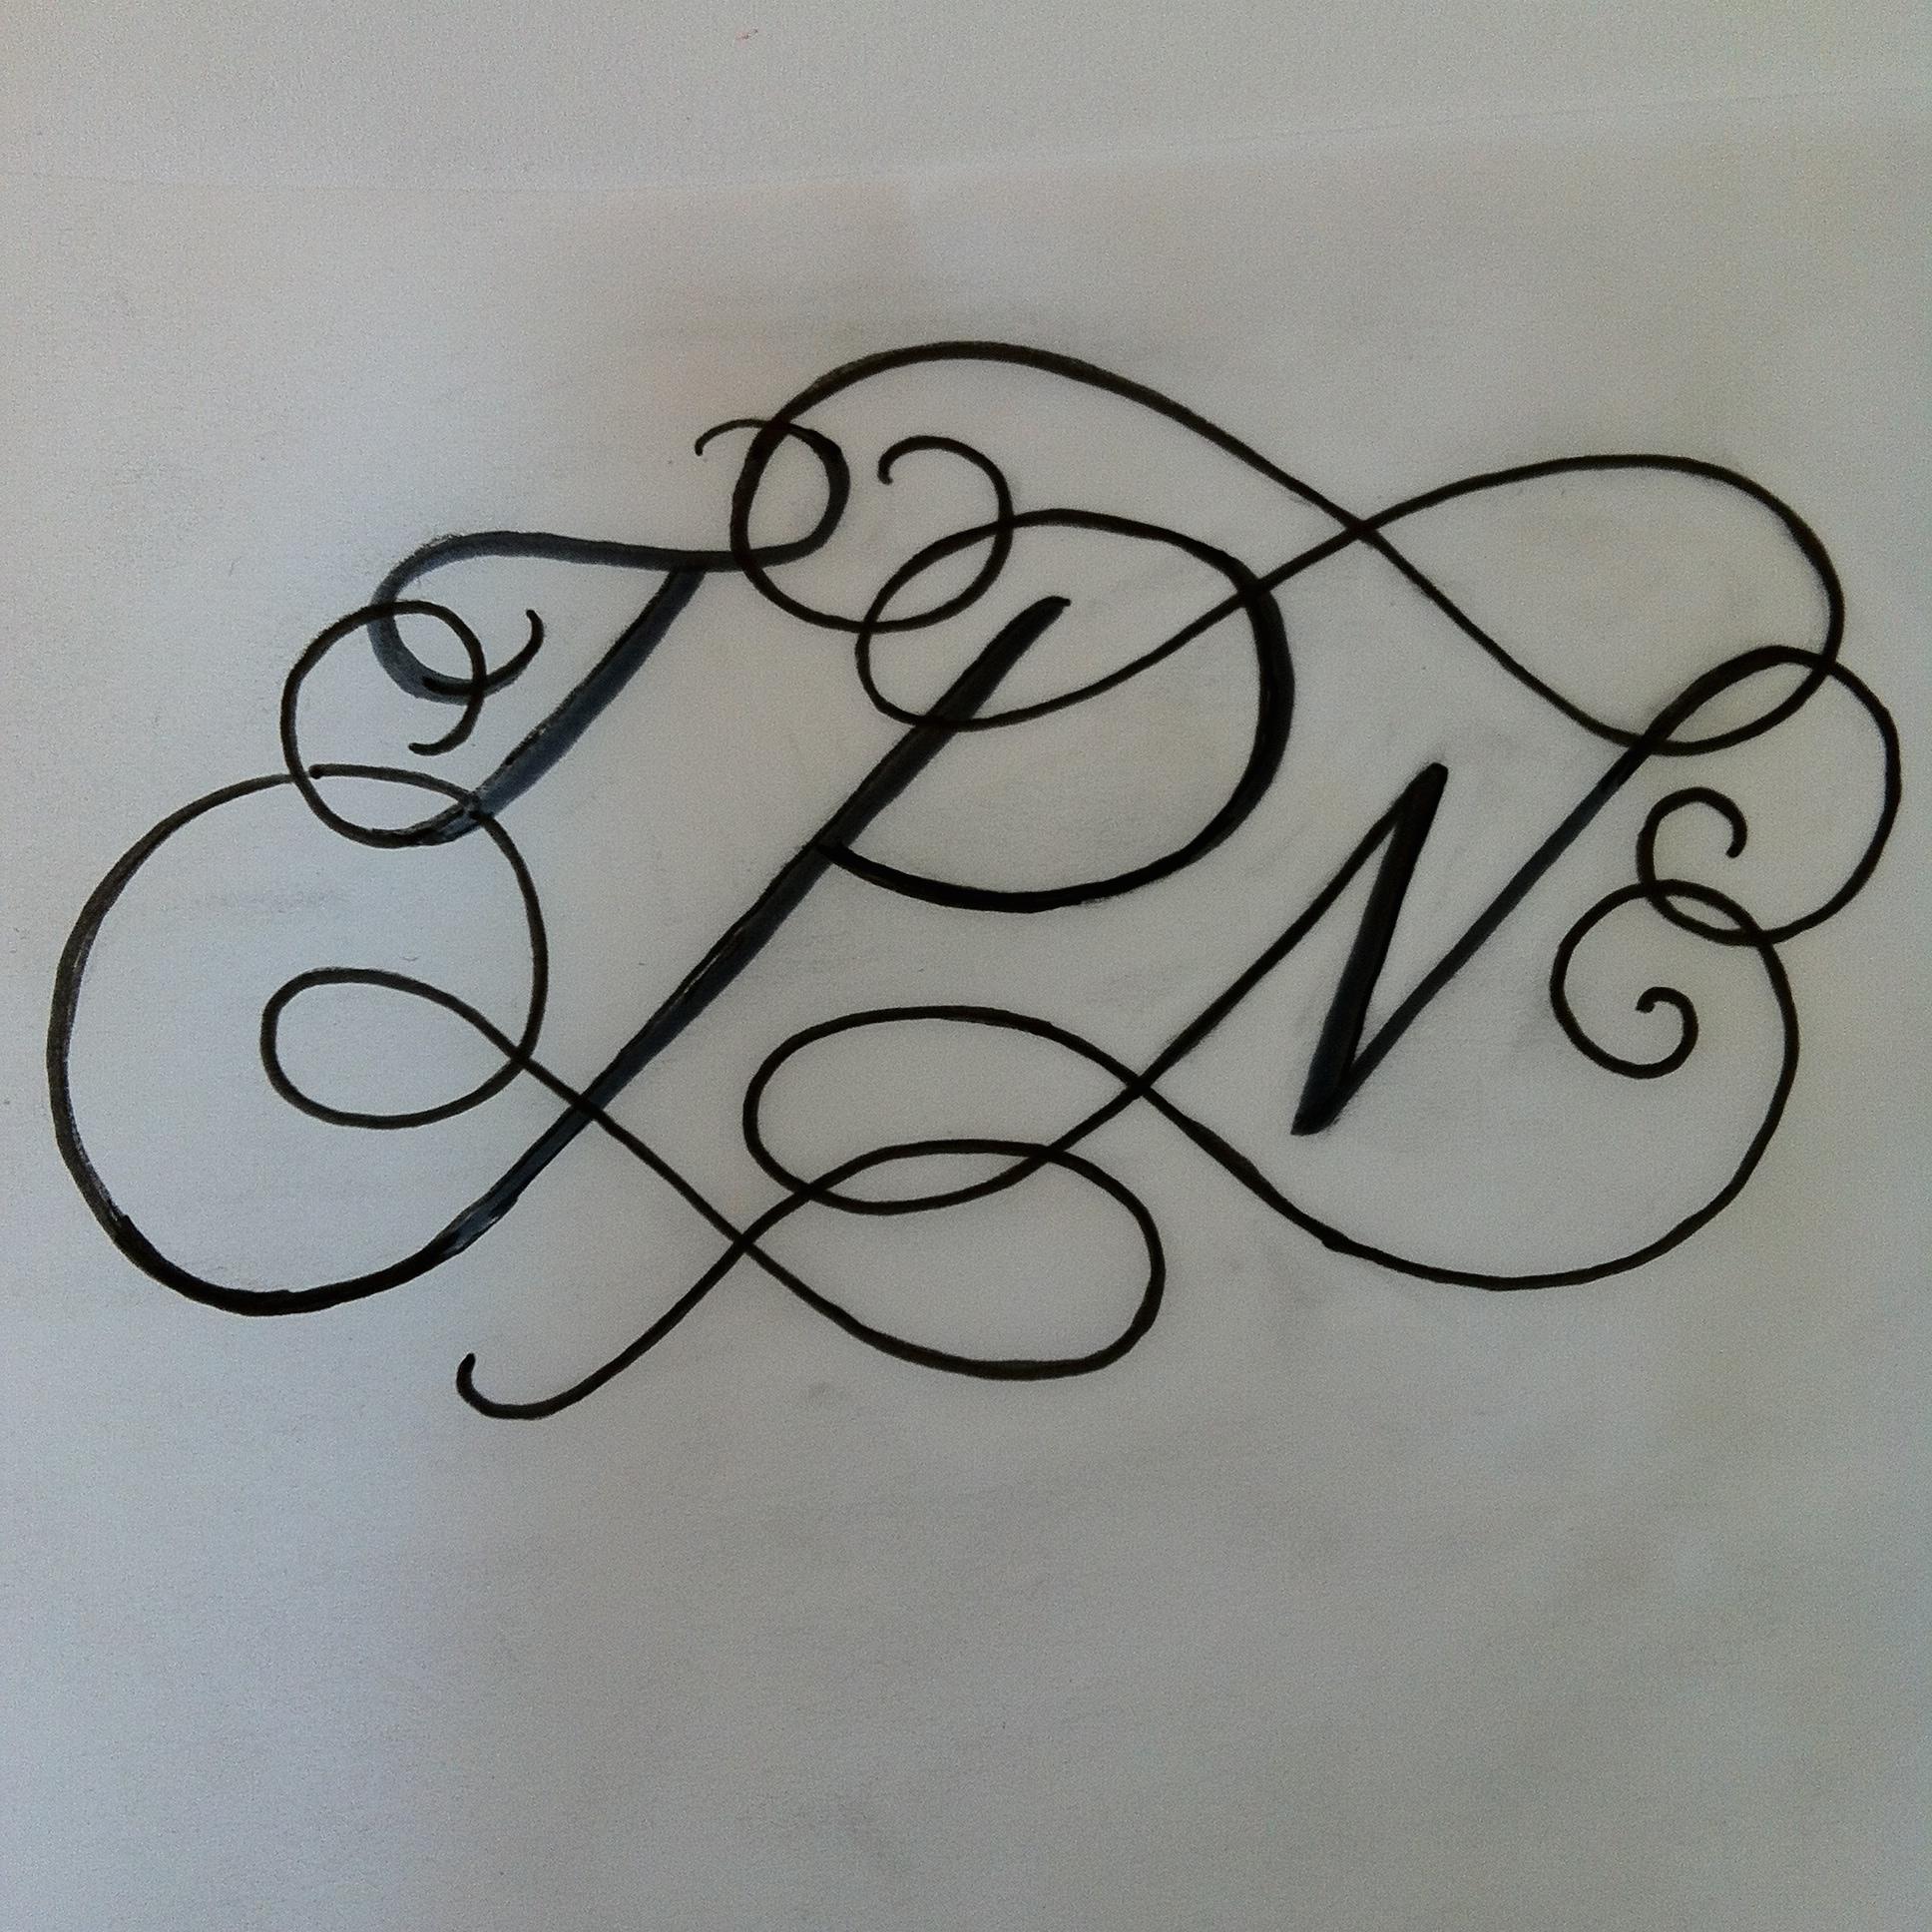 Original rough pen sketch of the monogram.